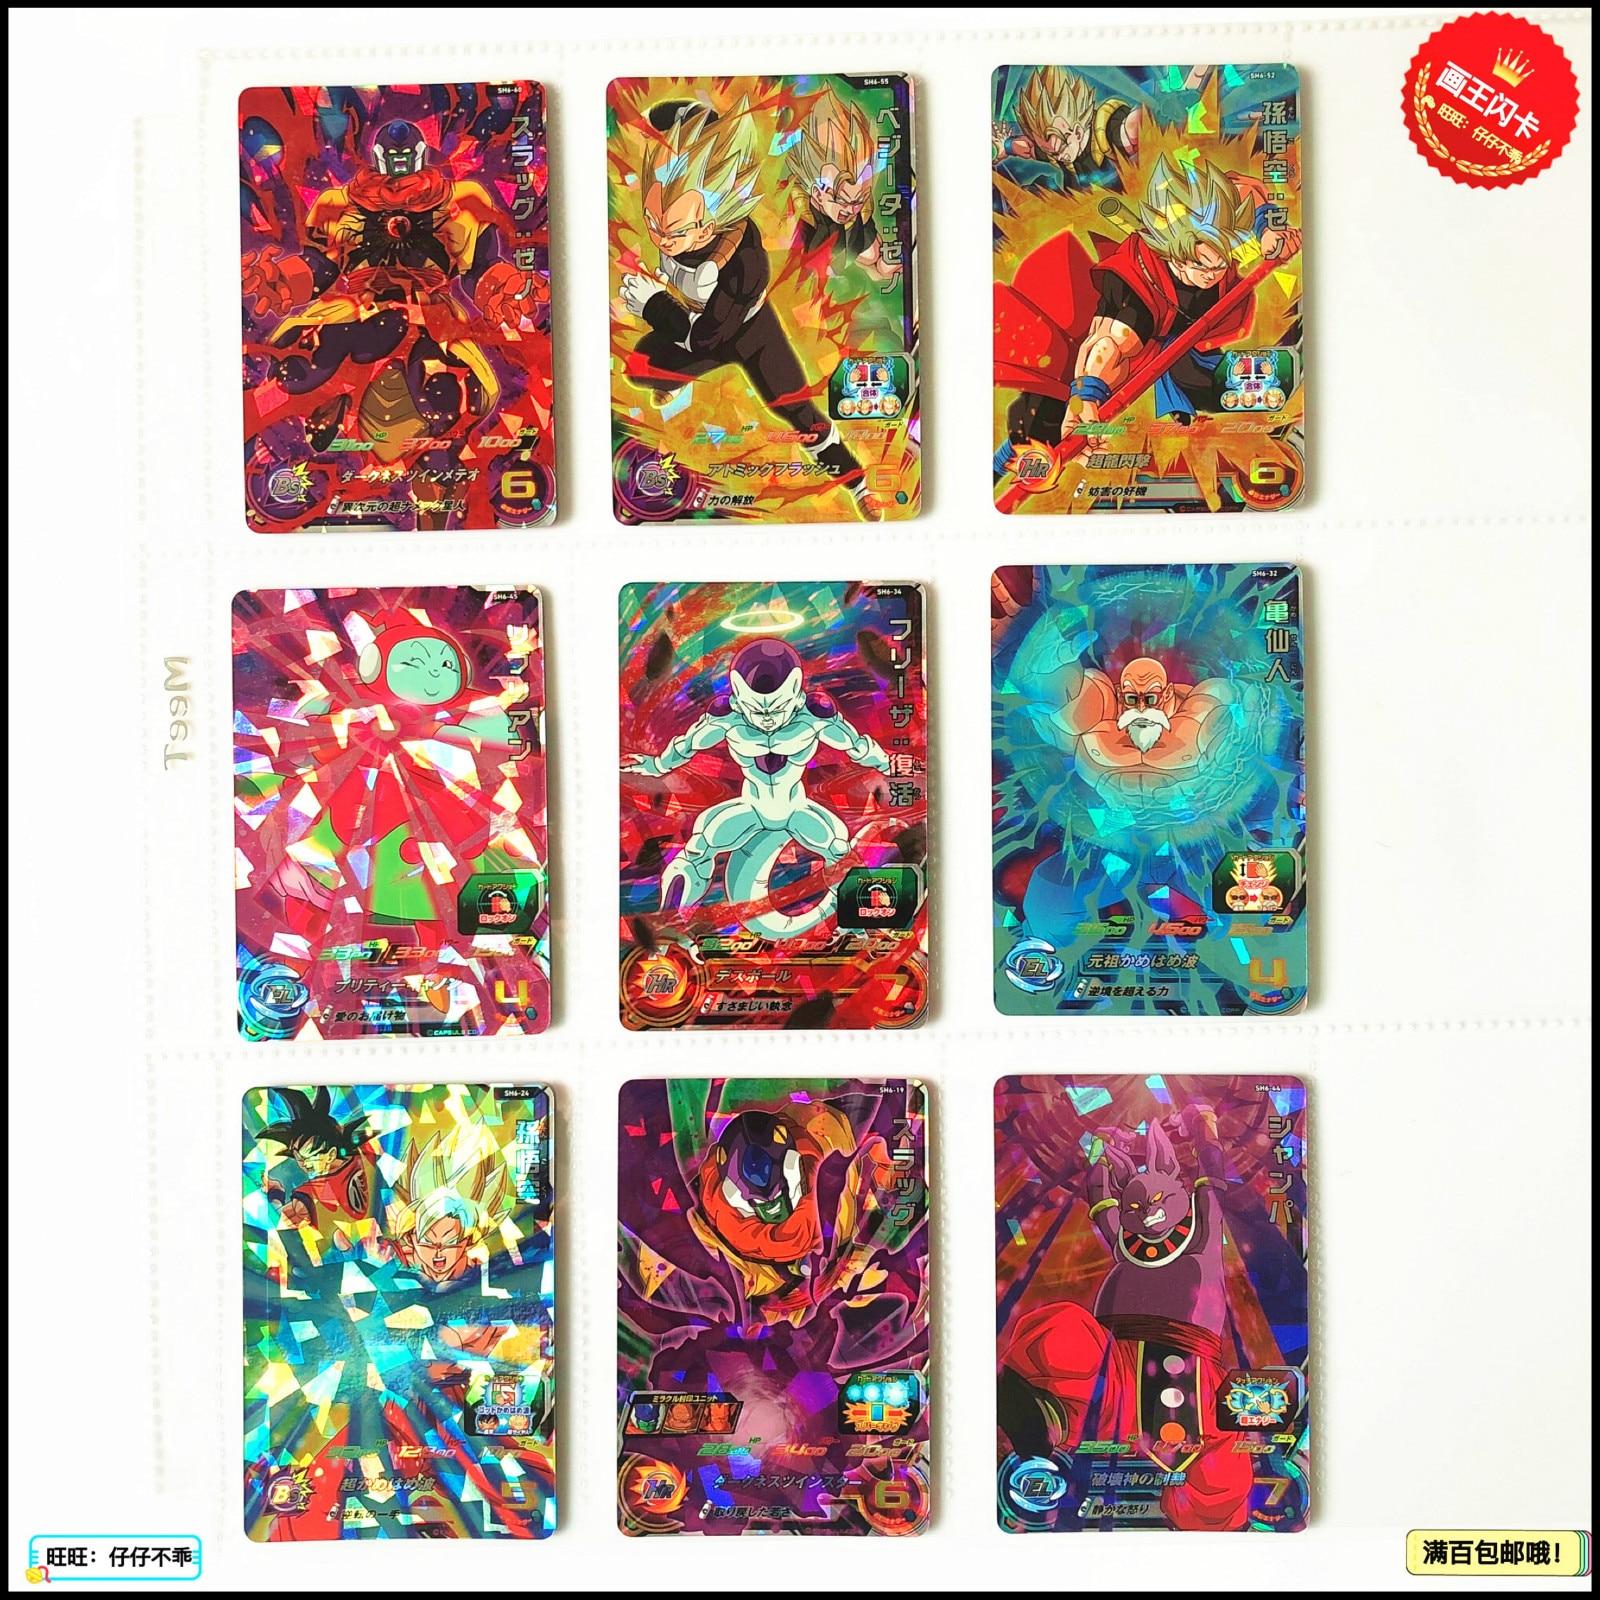 Japan Original Dragon Ball Hero Card SR Flash 3 Stars SH6 Shanpa Goku Toys Hobbies Collectibles Game Collection Anime Cards